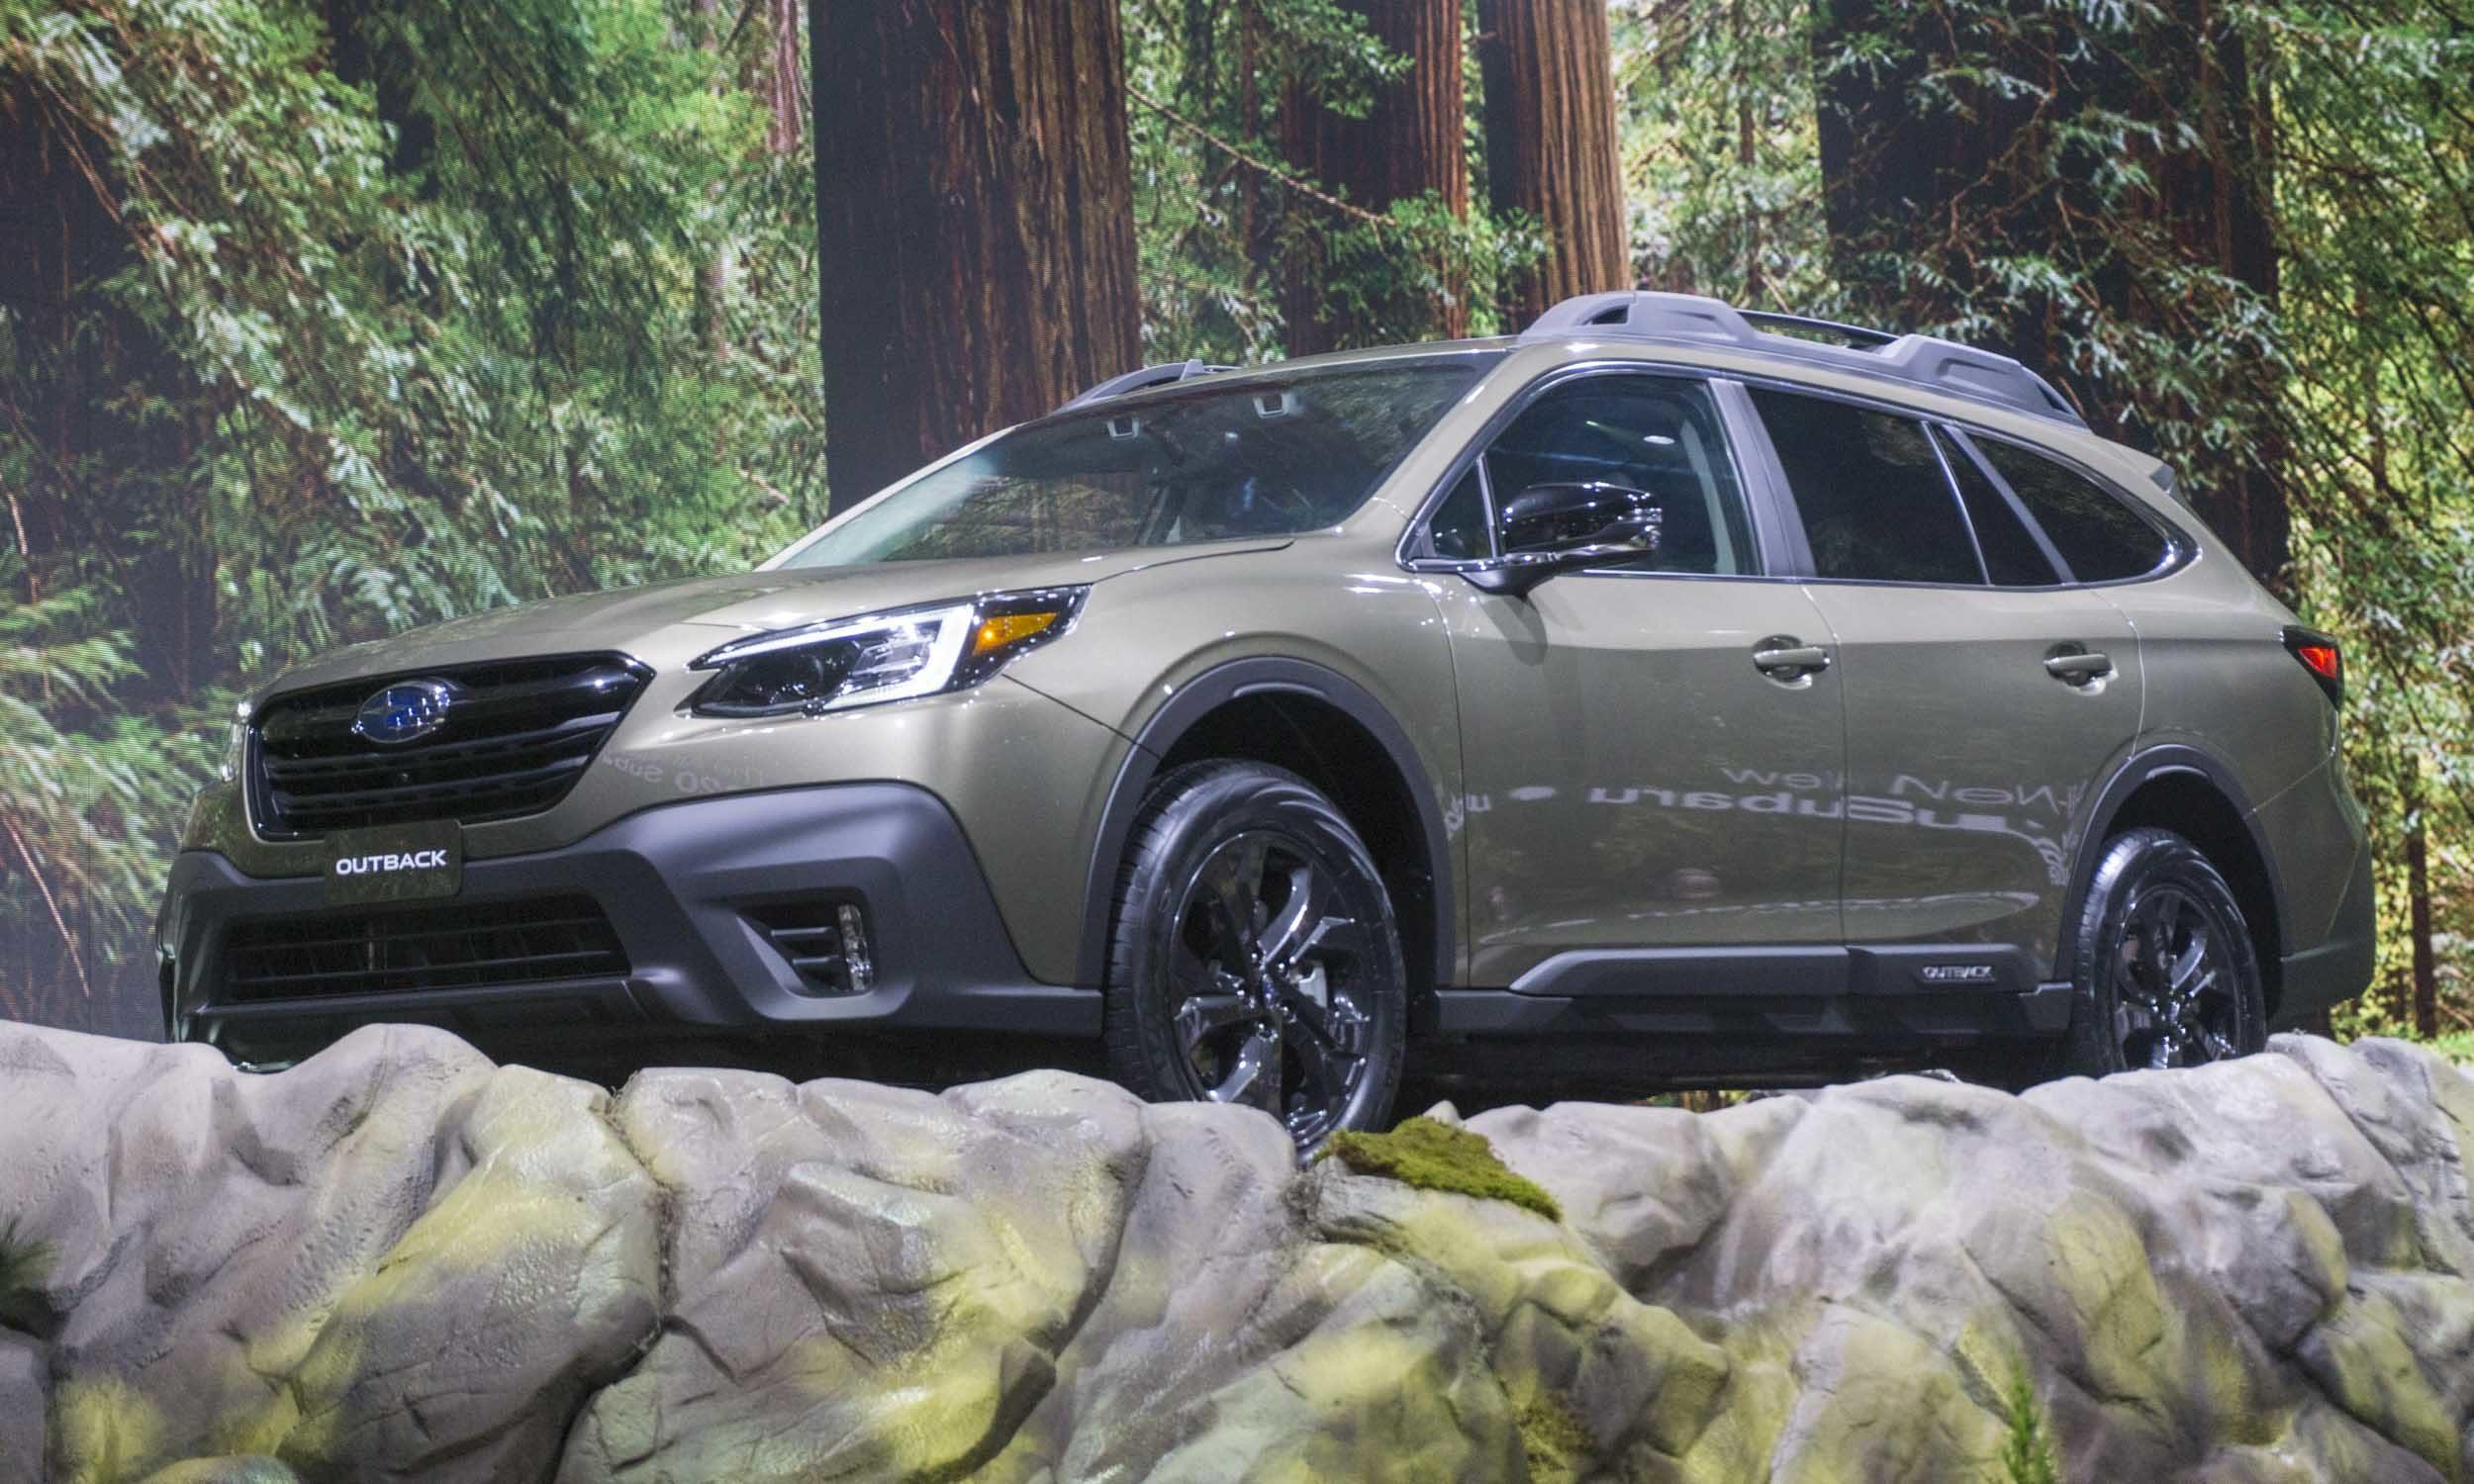 2020-Subaru-Outback12.jpg